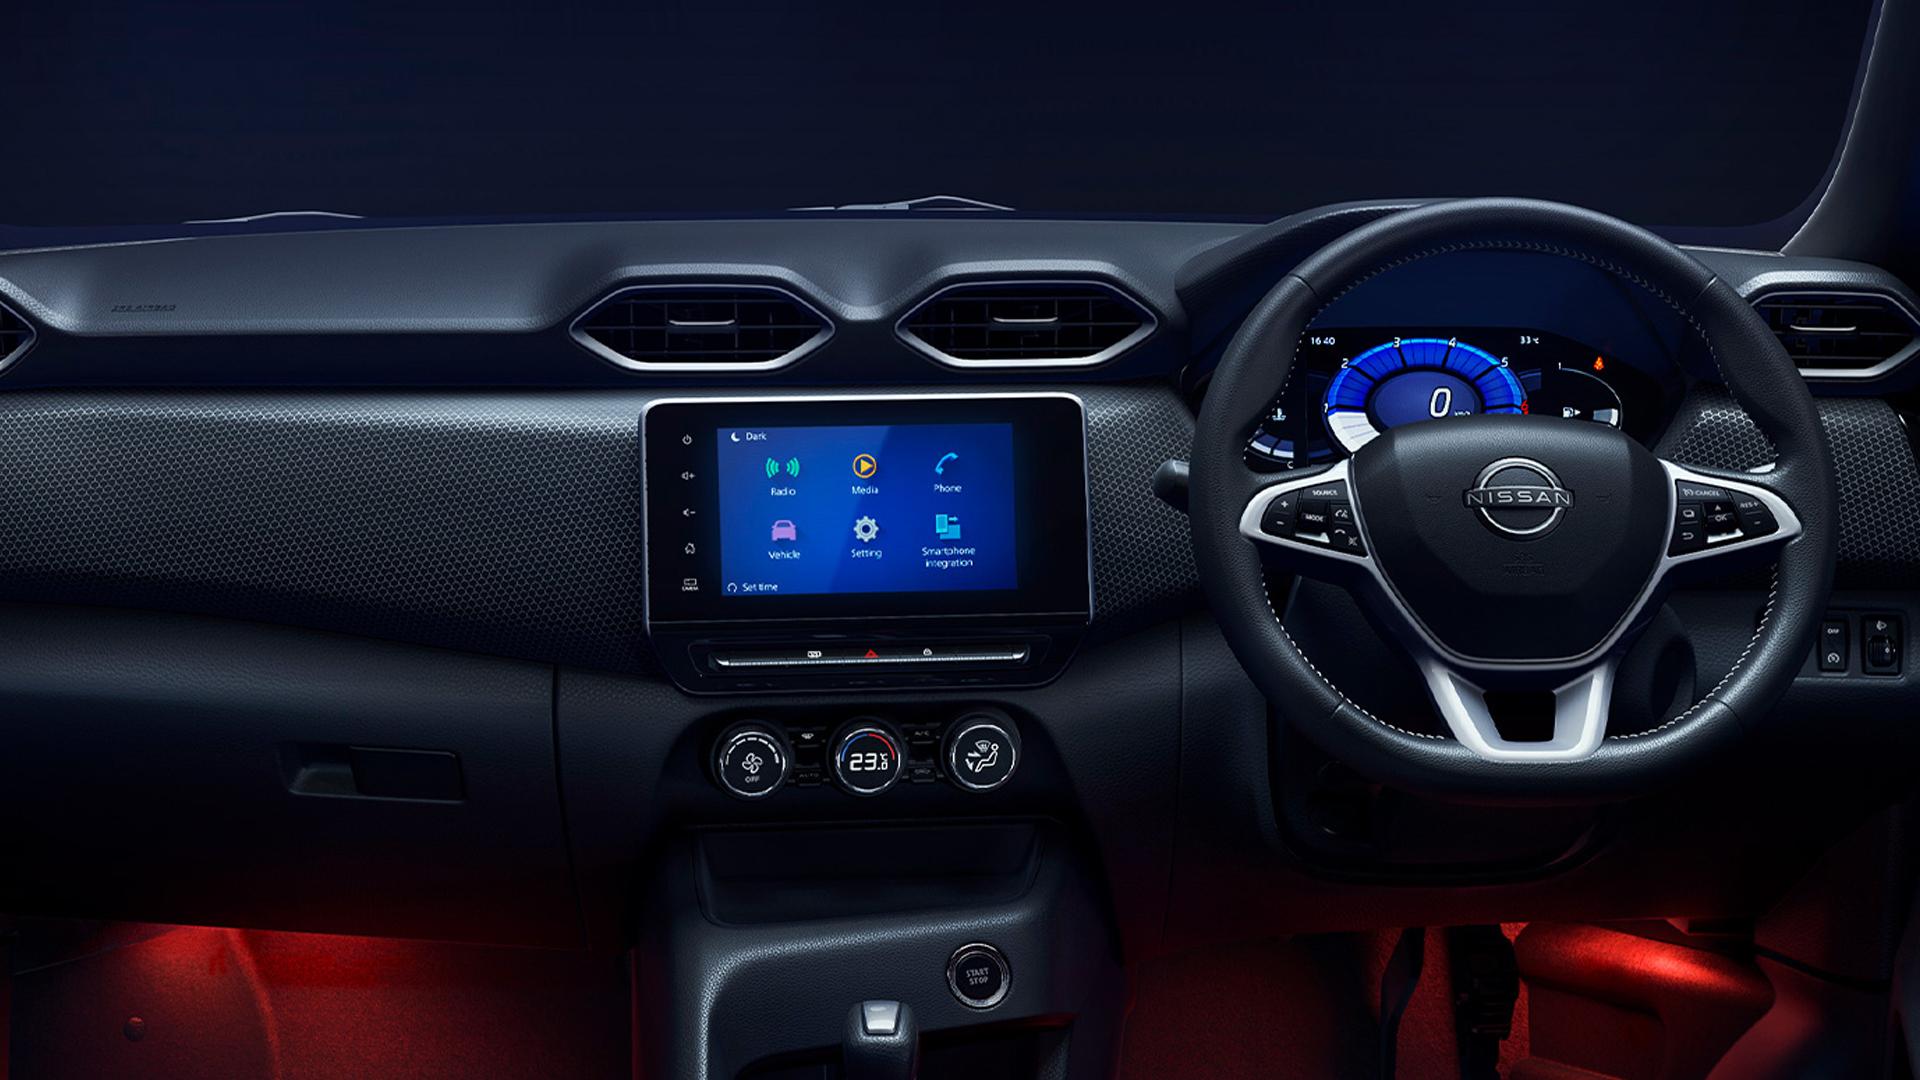 Nissan Magnite 2020 XV Premium 1.0 Turbo PETROL 5 CVT Exterior